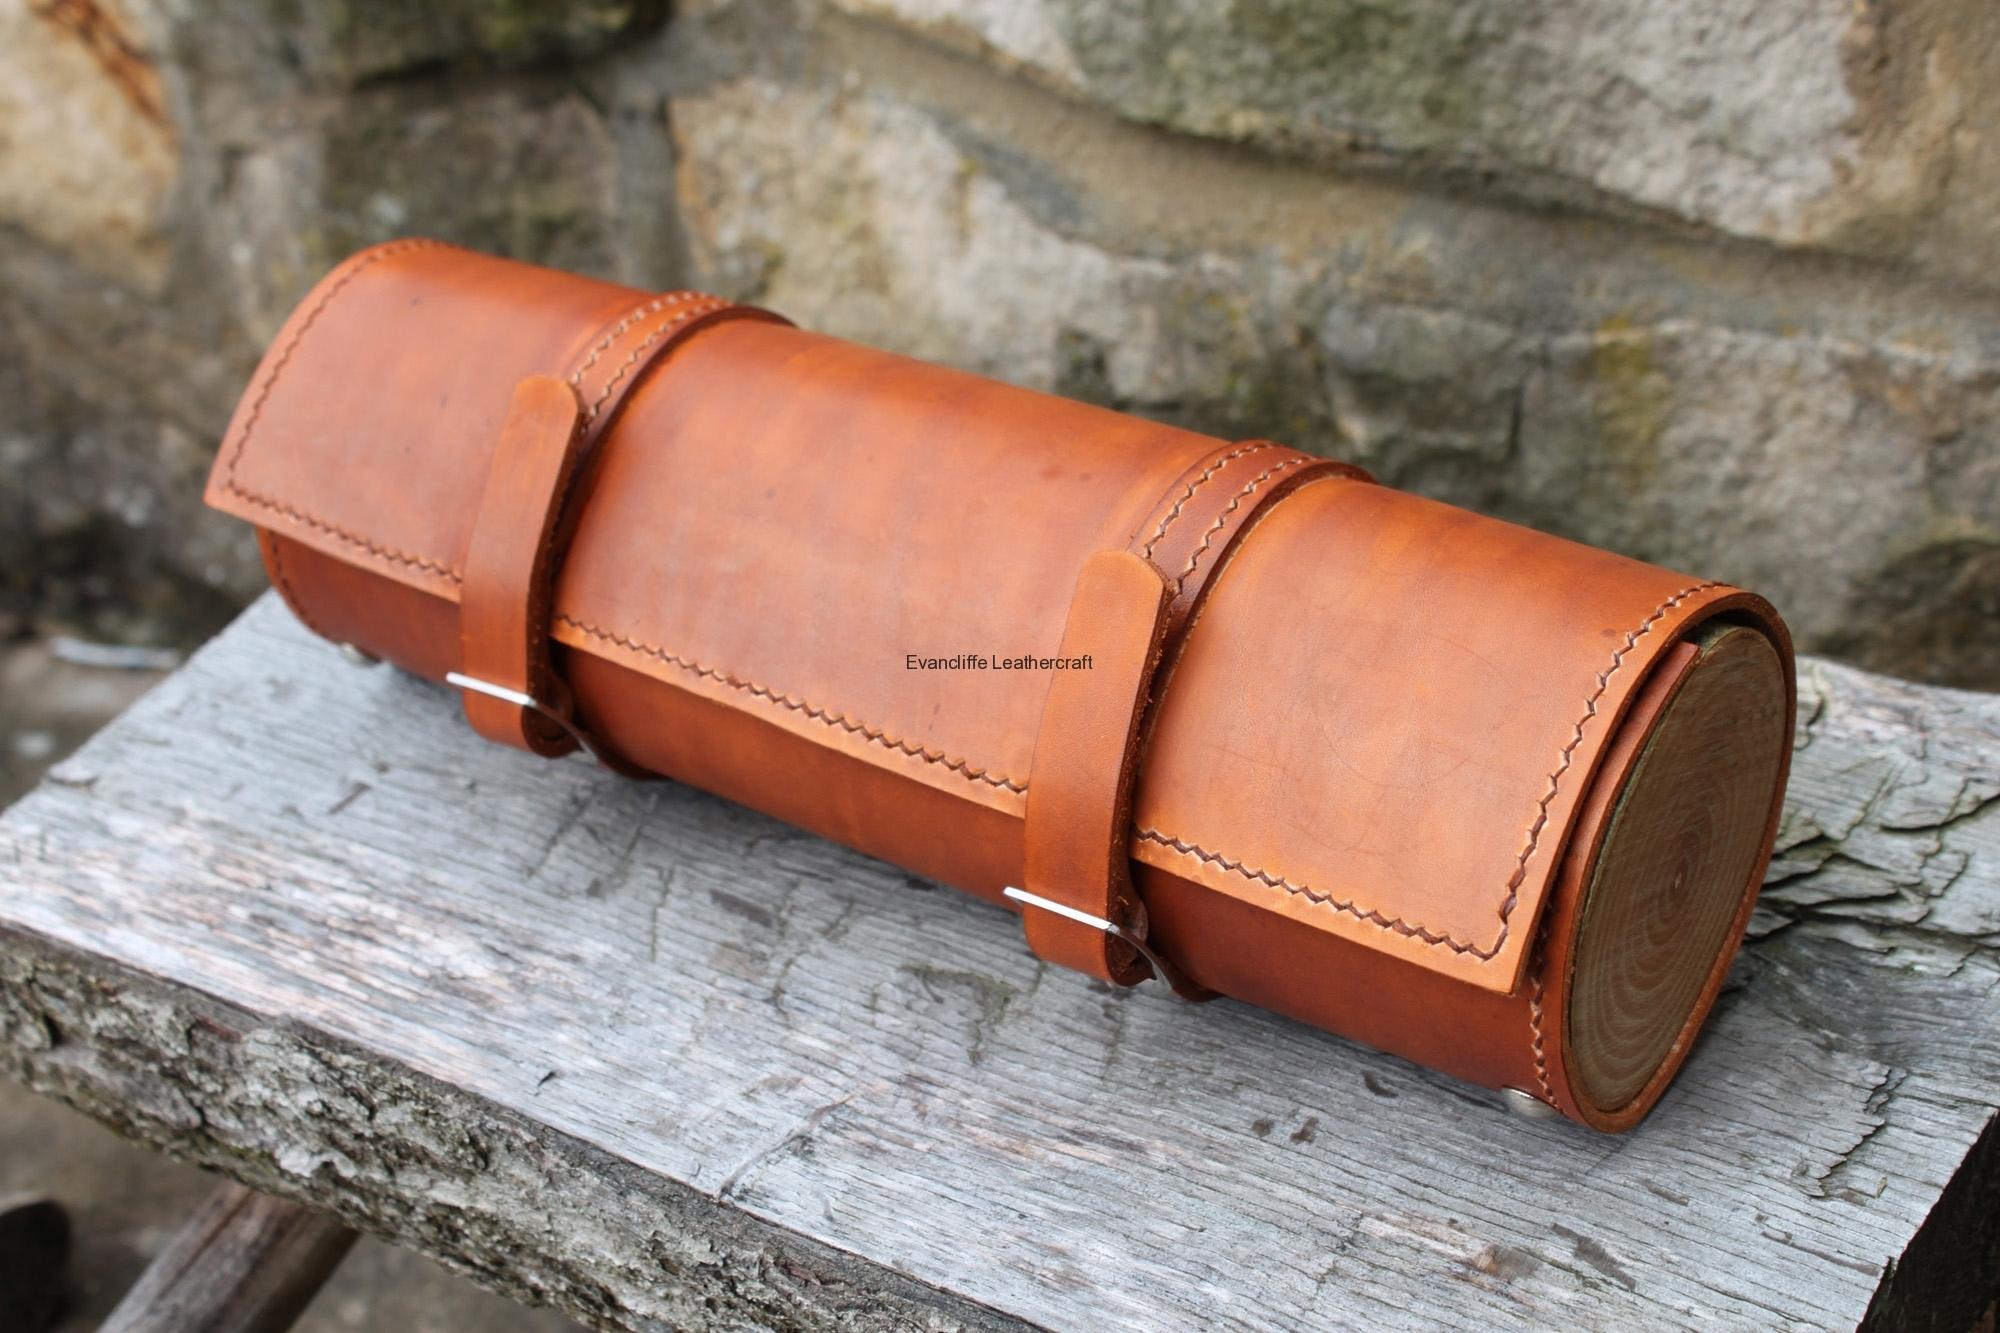 Barrel Bag by Evancliffe Leathercraft